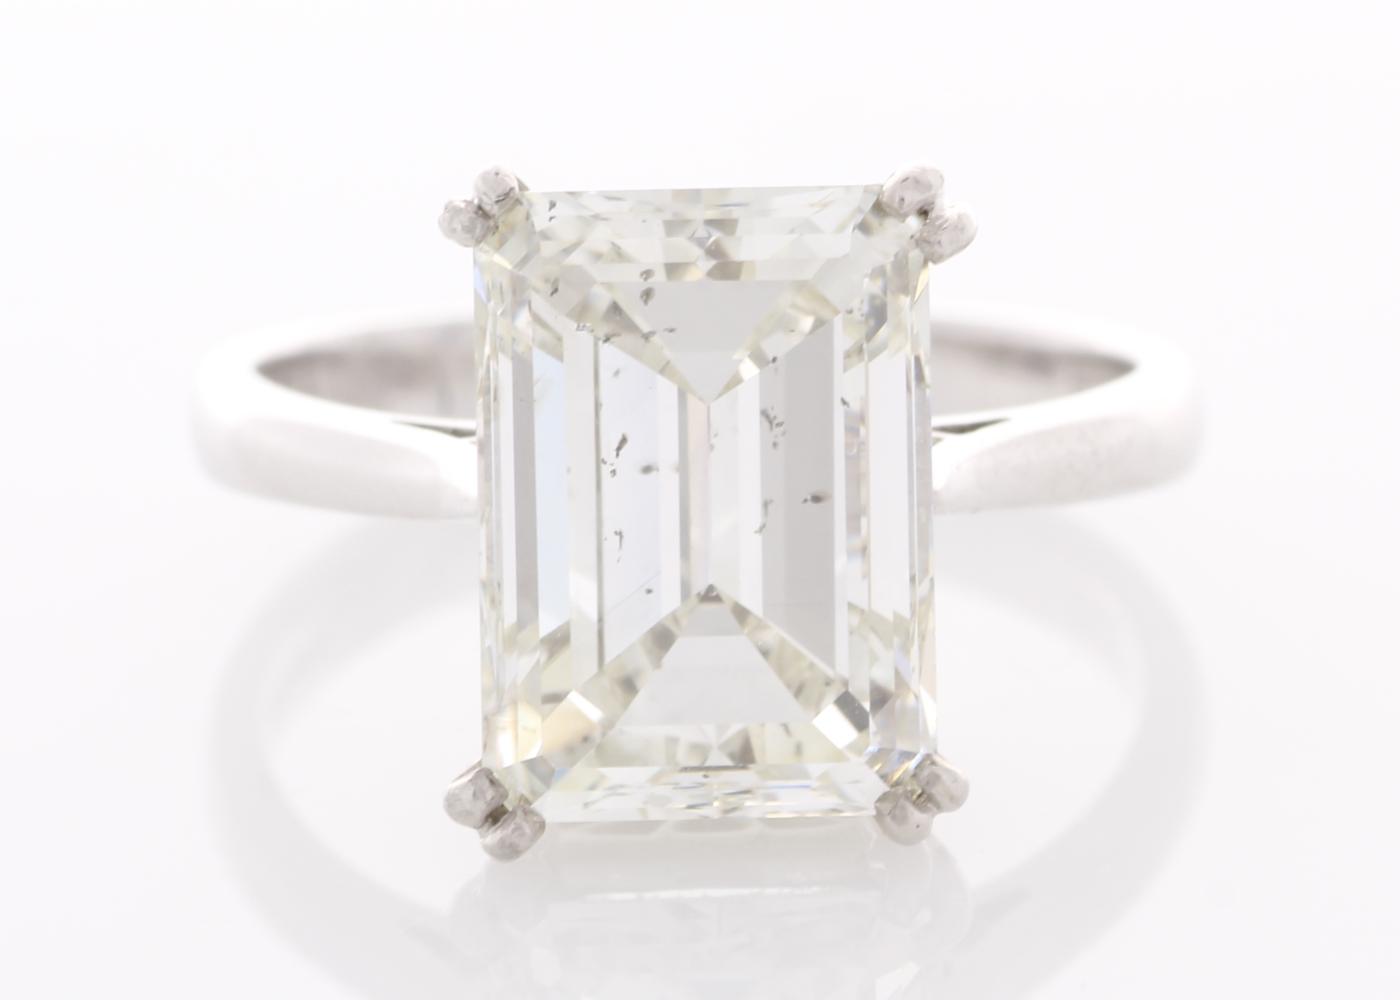 Lot 2 - 18ct White Gold Single Stone Prong Set Diamond Ring 5.86 Carats HRD I SI2